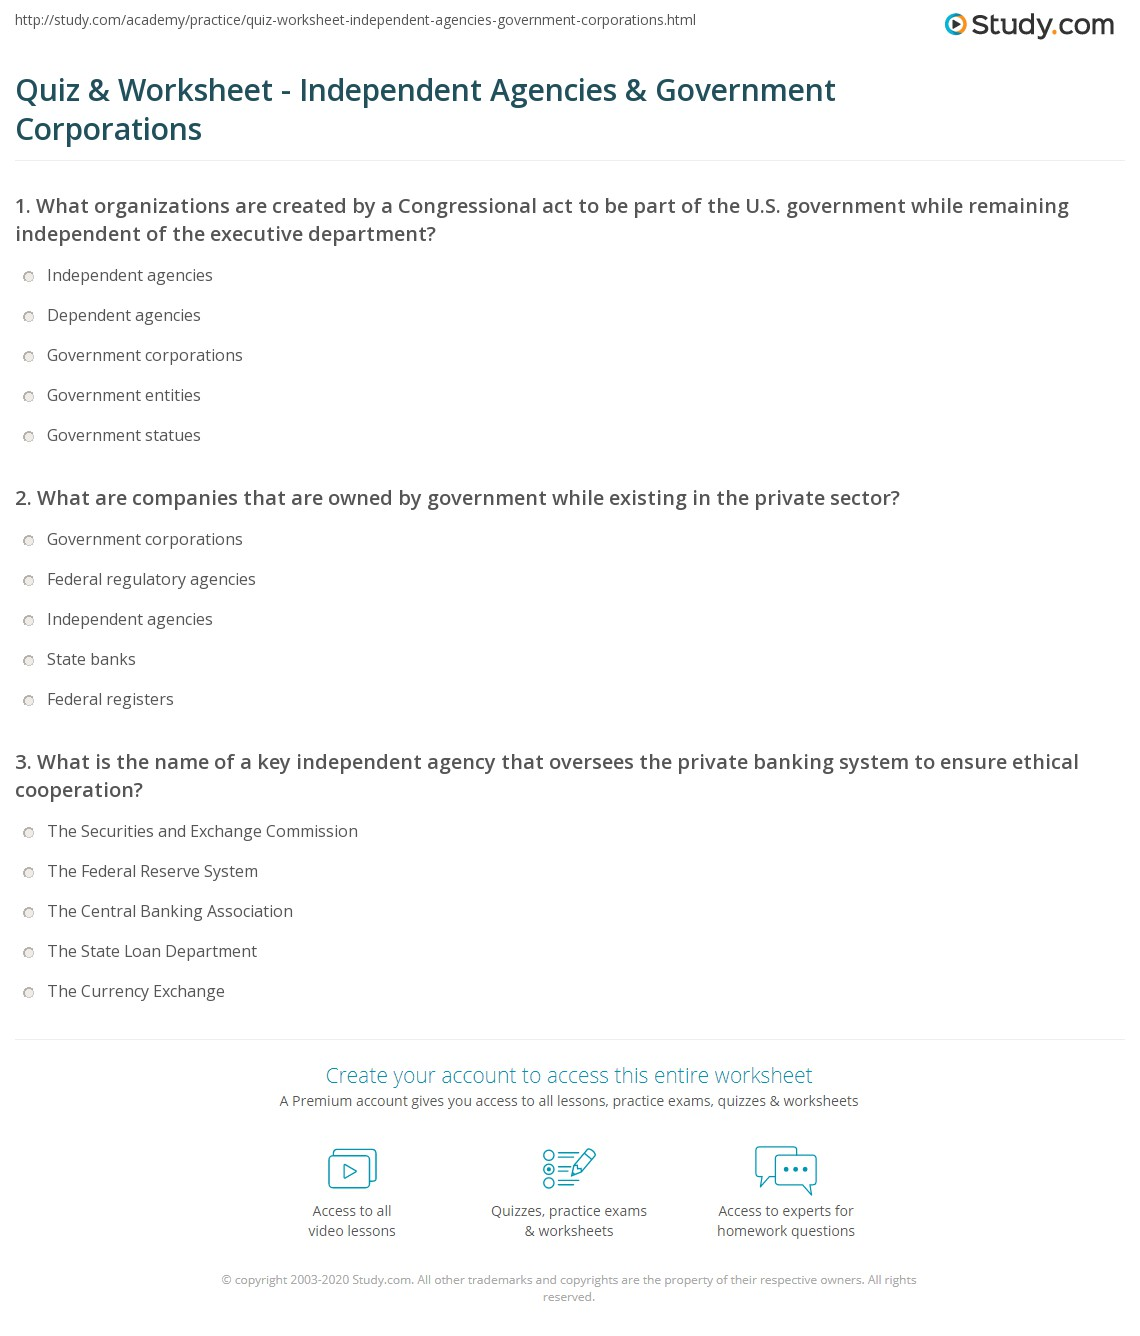 Quiz & Worksheet - Independent Agencies & Government Corporations ...